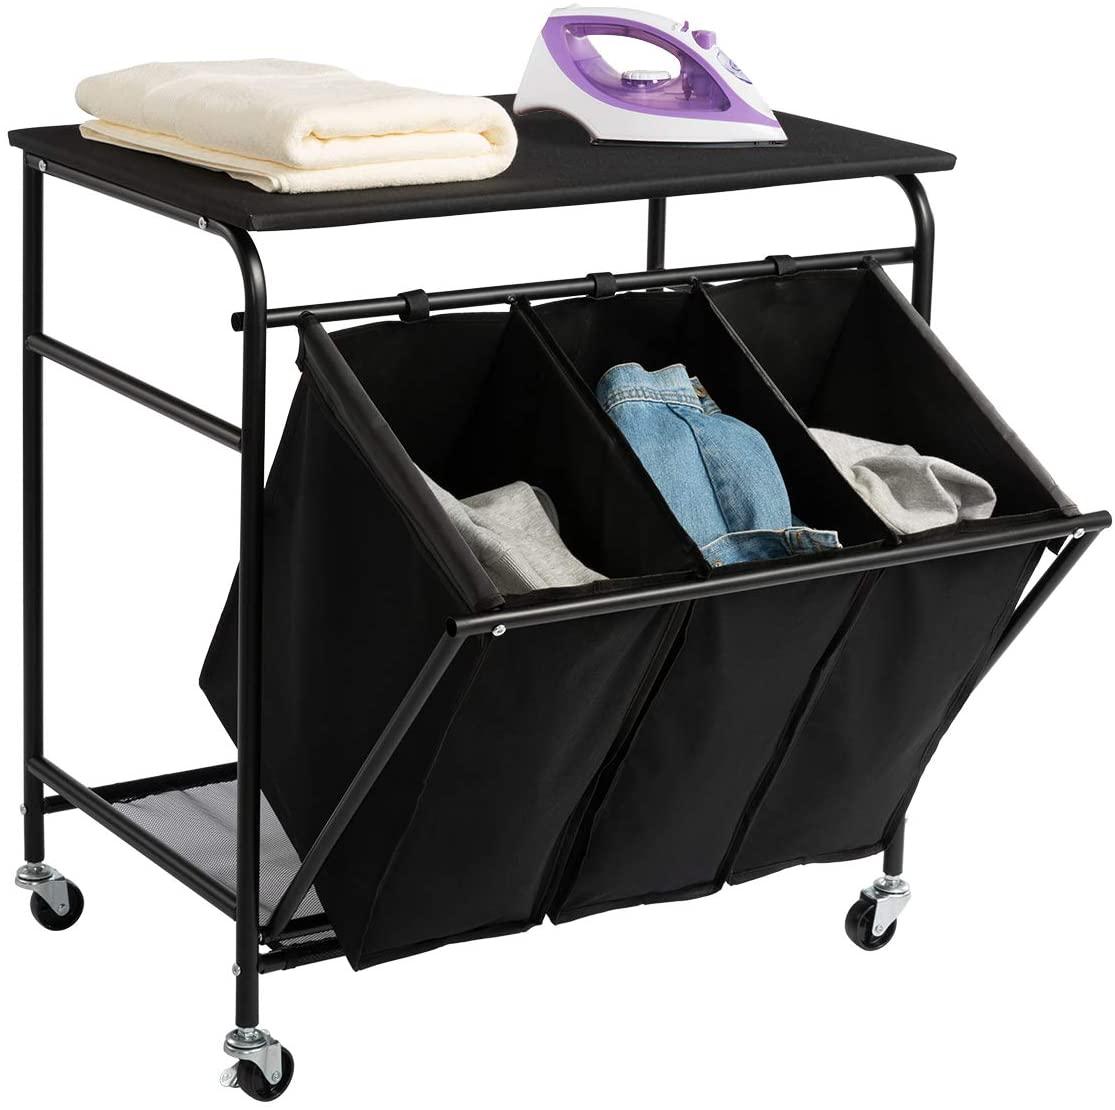 HollyHOME Laundry Sorter